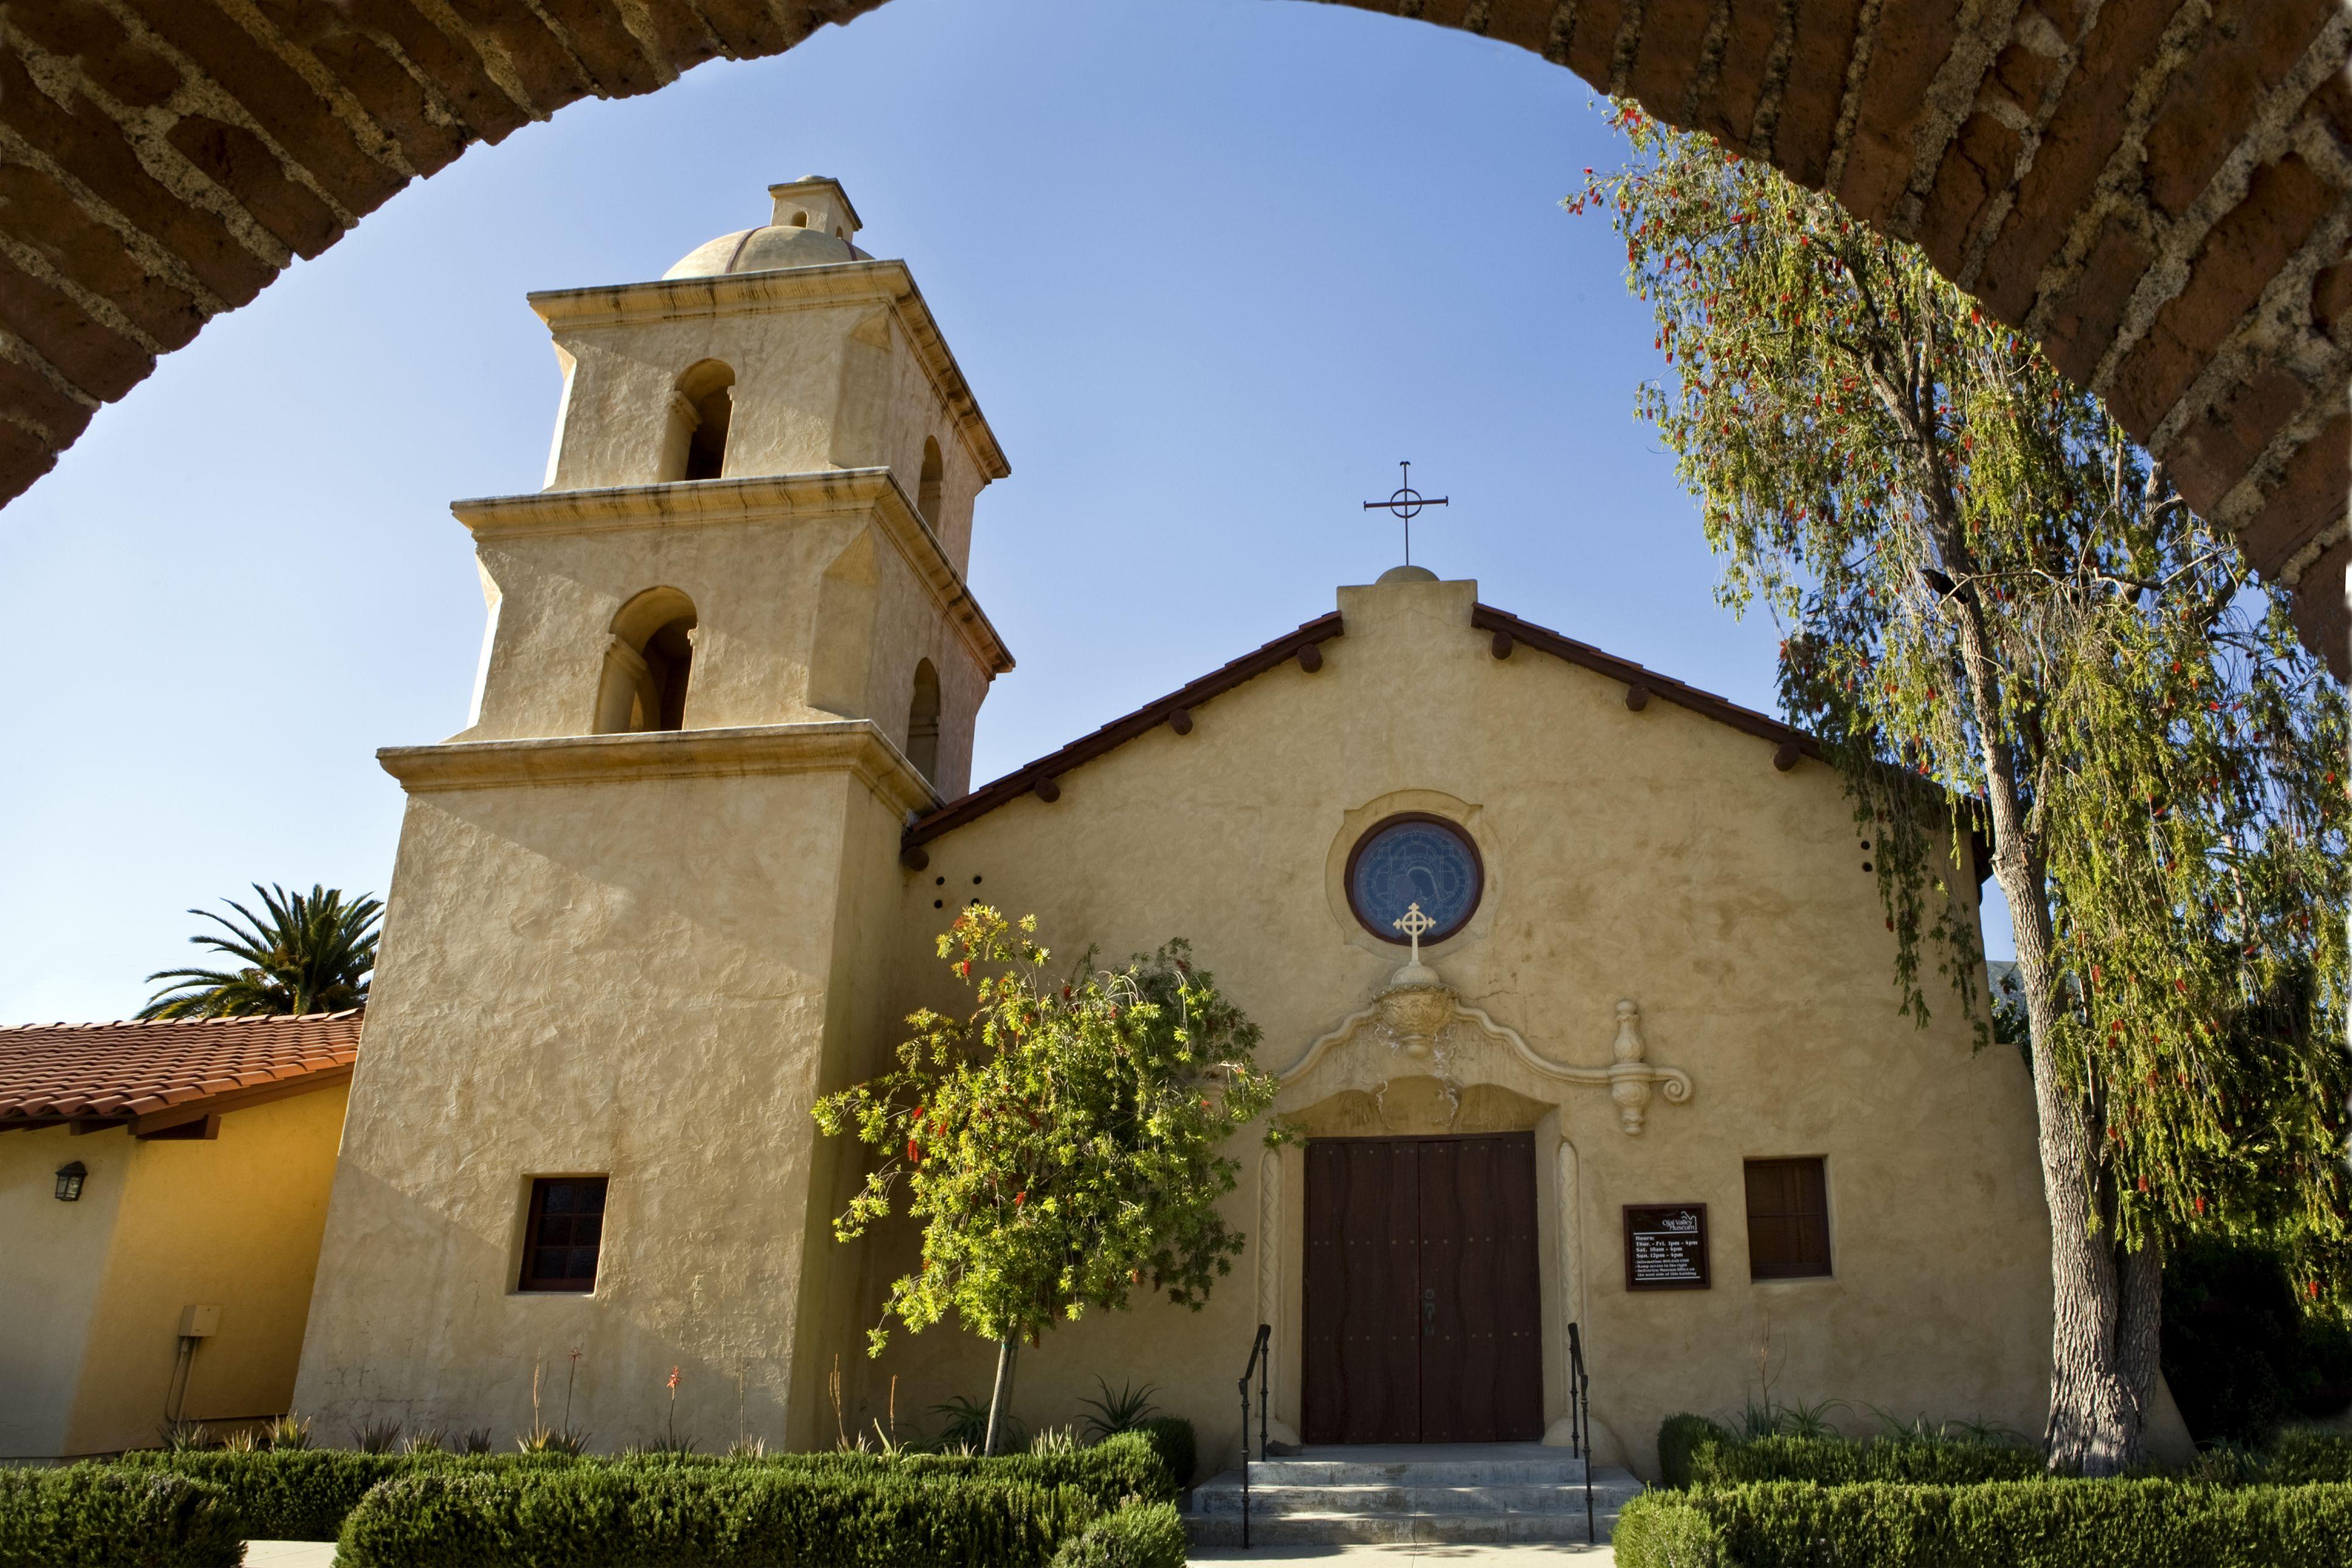 Old Mission at Ojai, CA